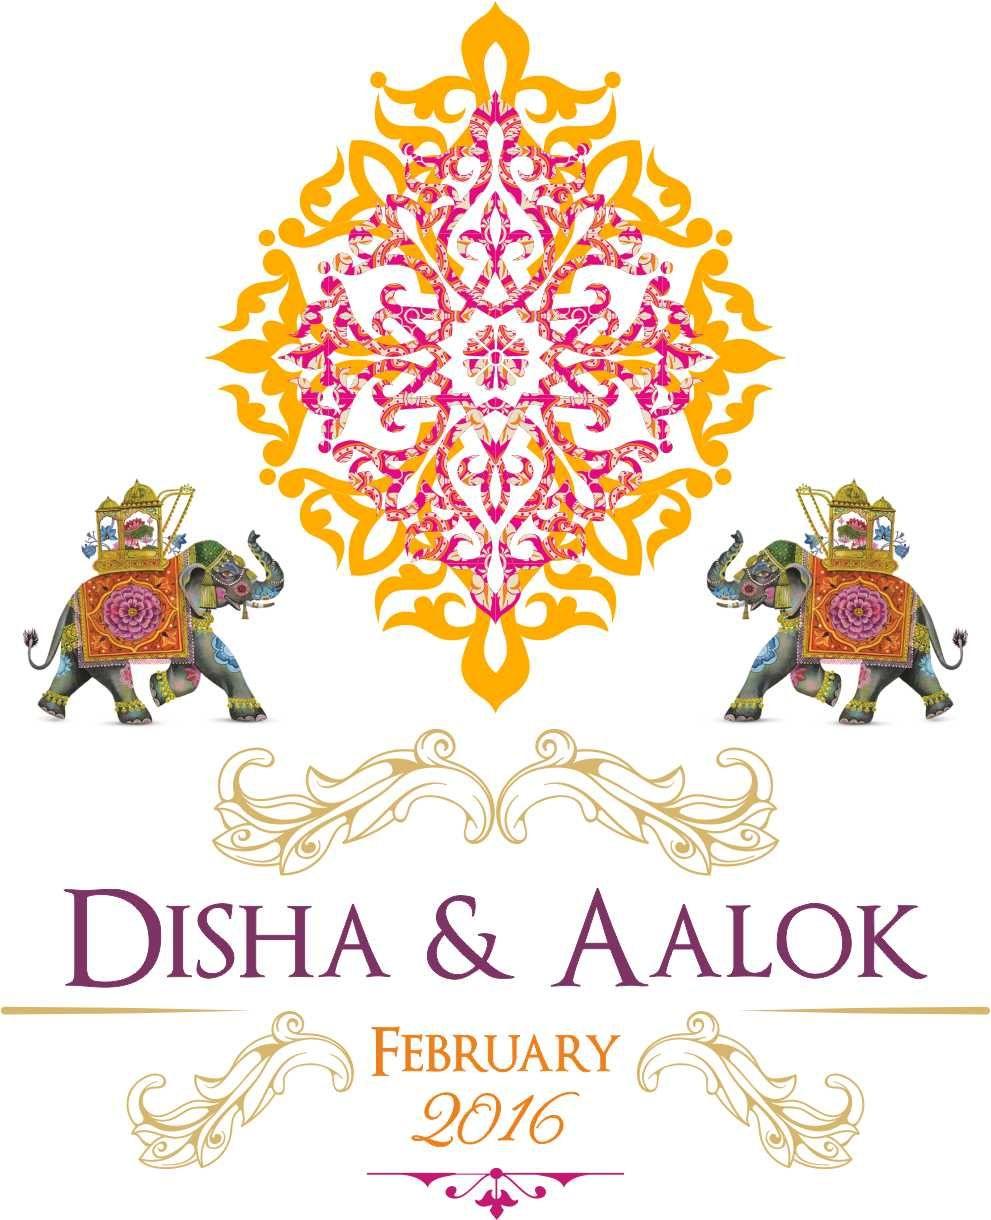 Free Online Indian Wedding Invitation Website: Wedding Invitation Cards, Indian Wedding Cards, Invites